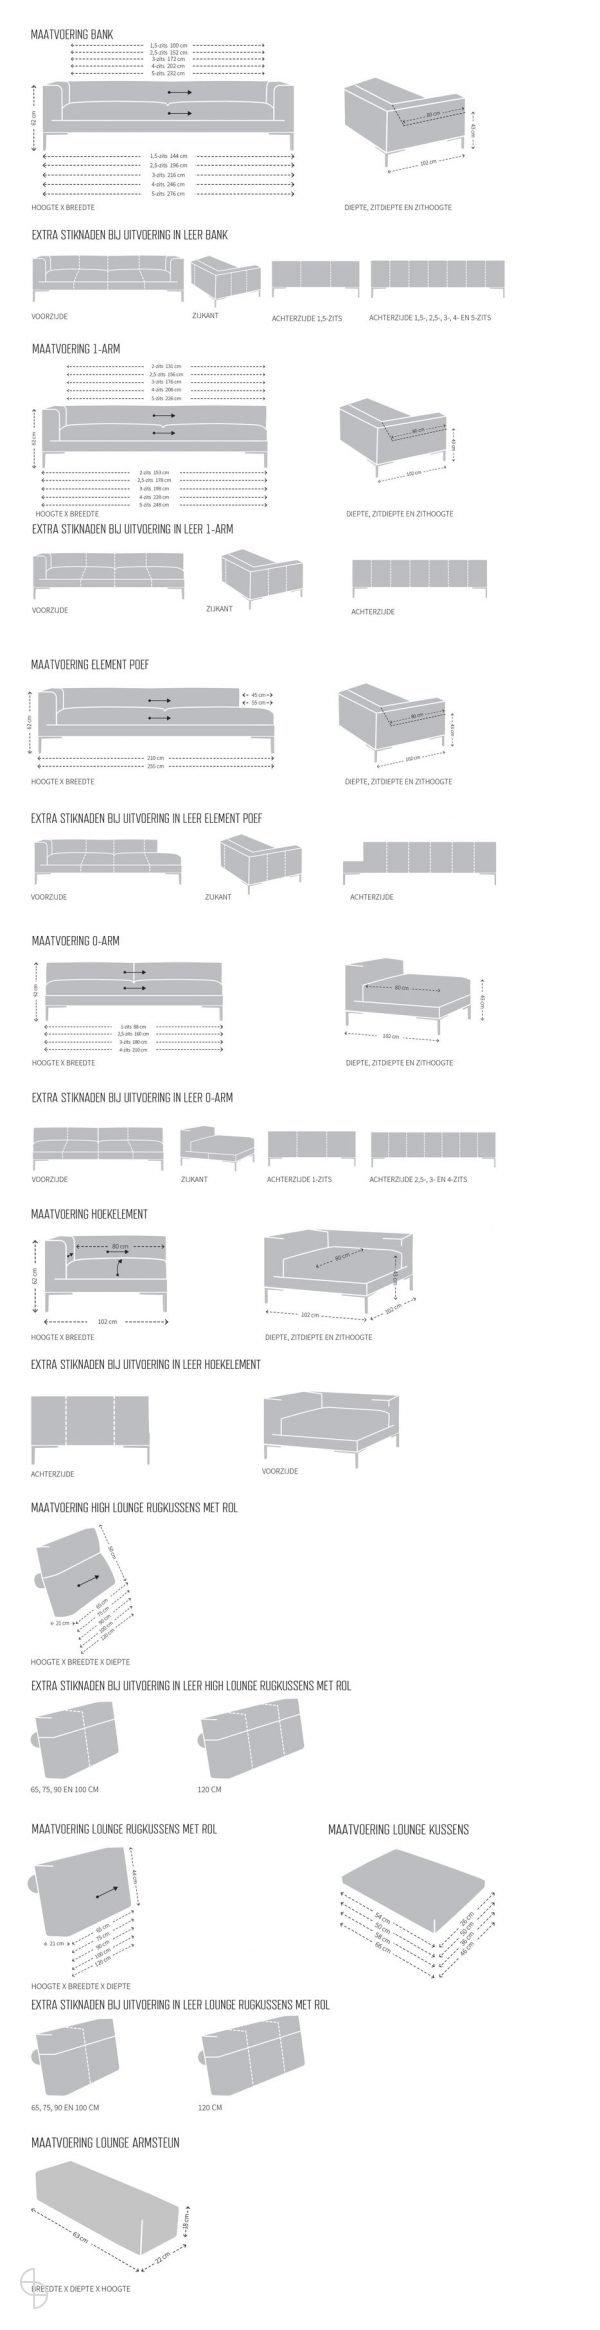 design on stock aikon loungs afmetingen